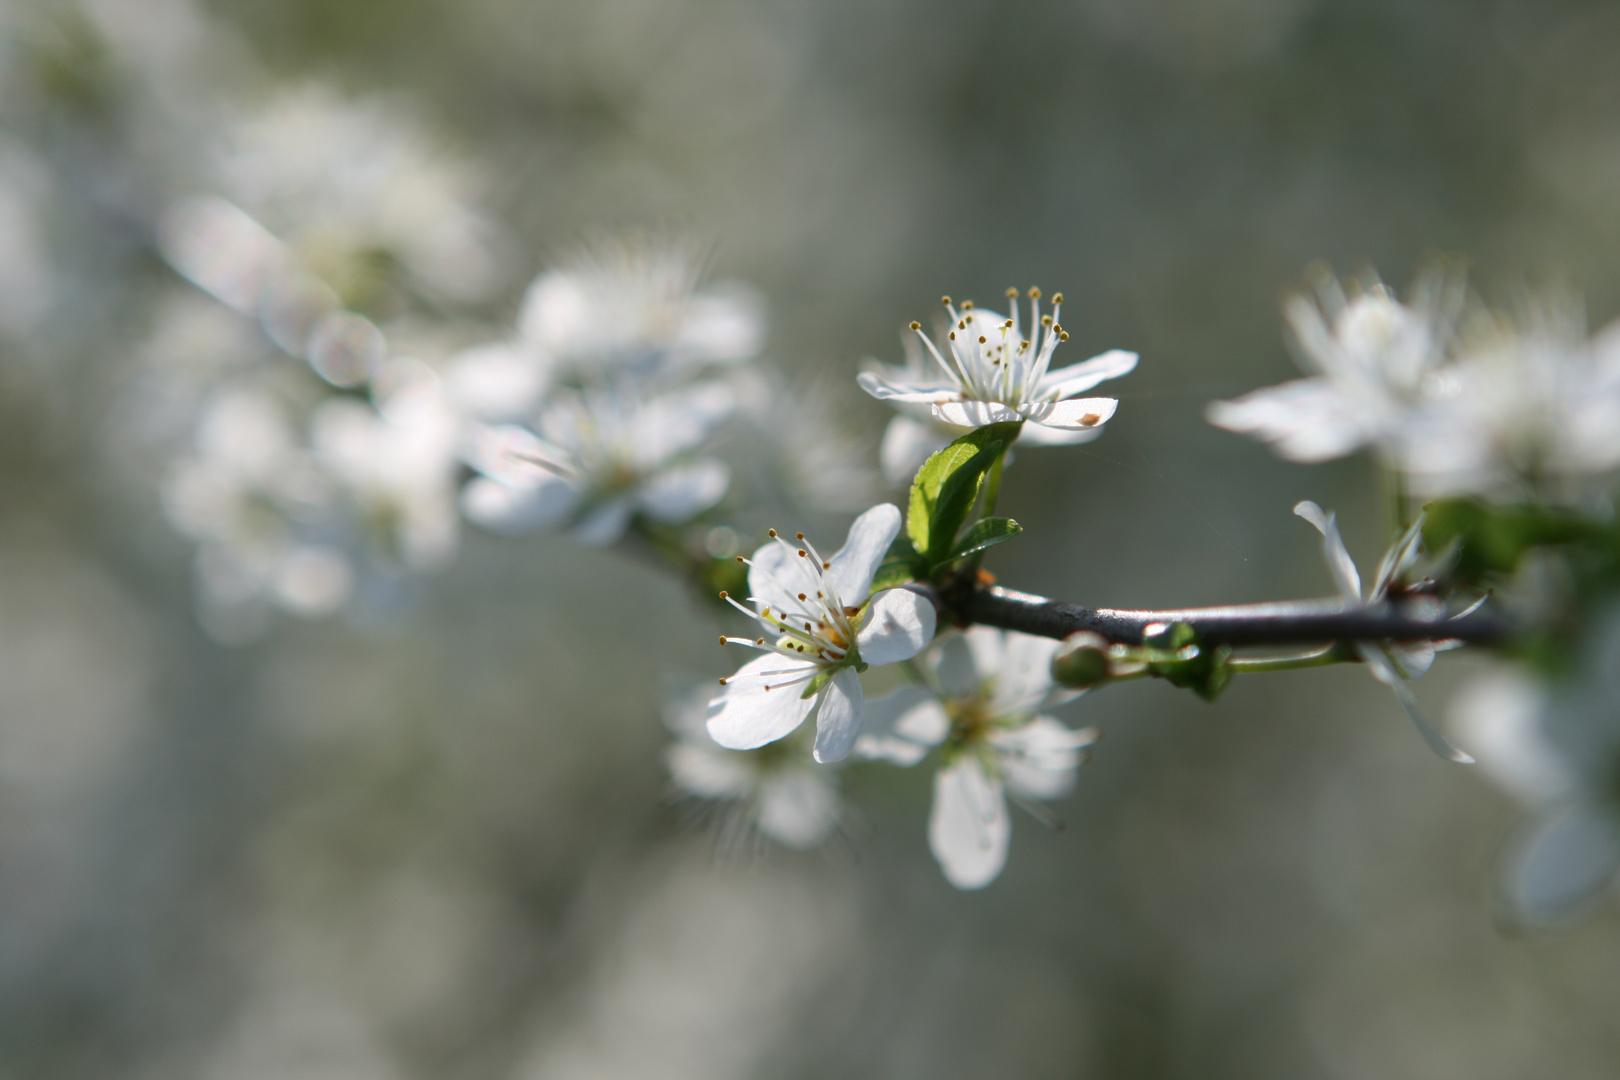 Unschuldig weiss kommt er daher, der Frühling...